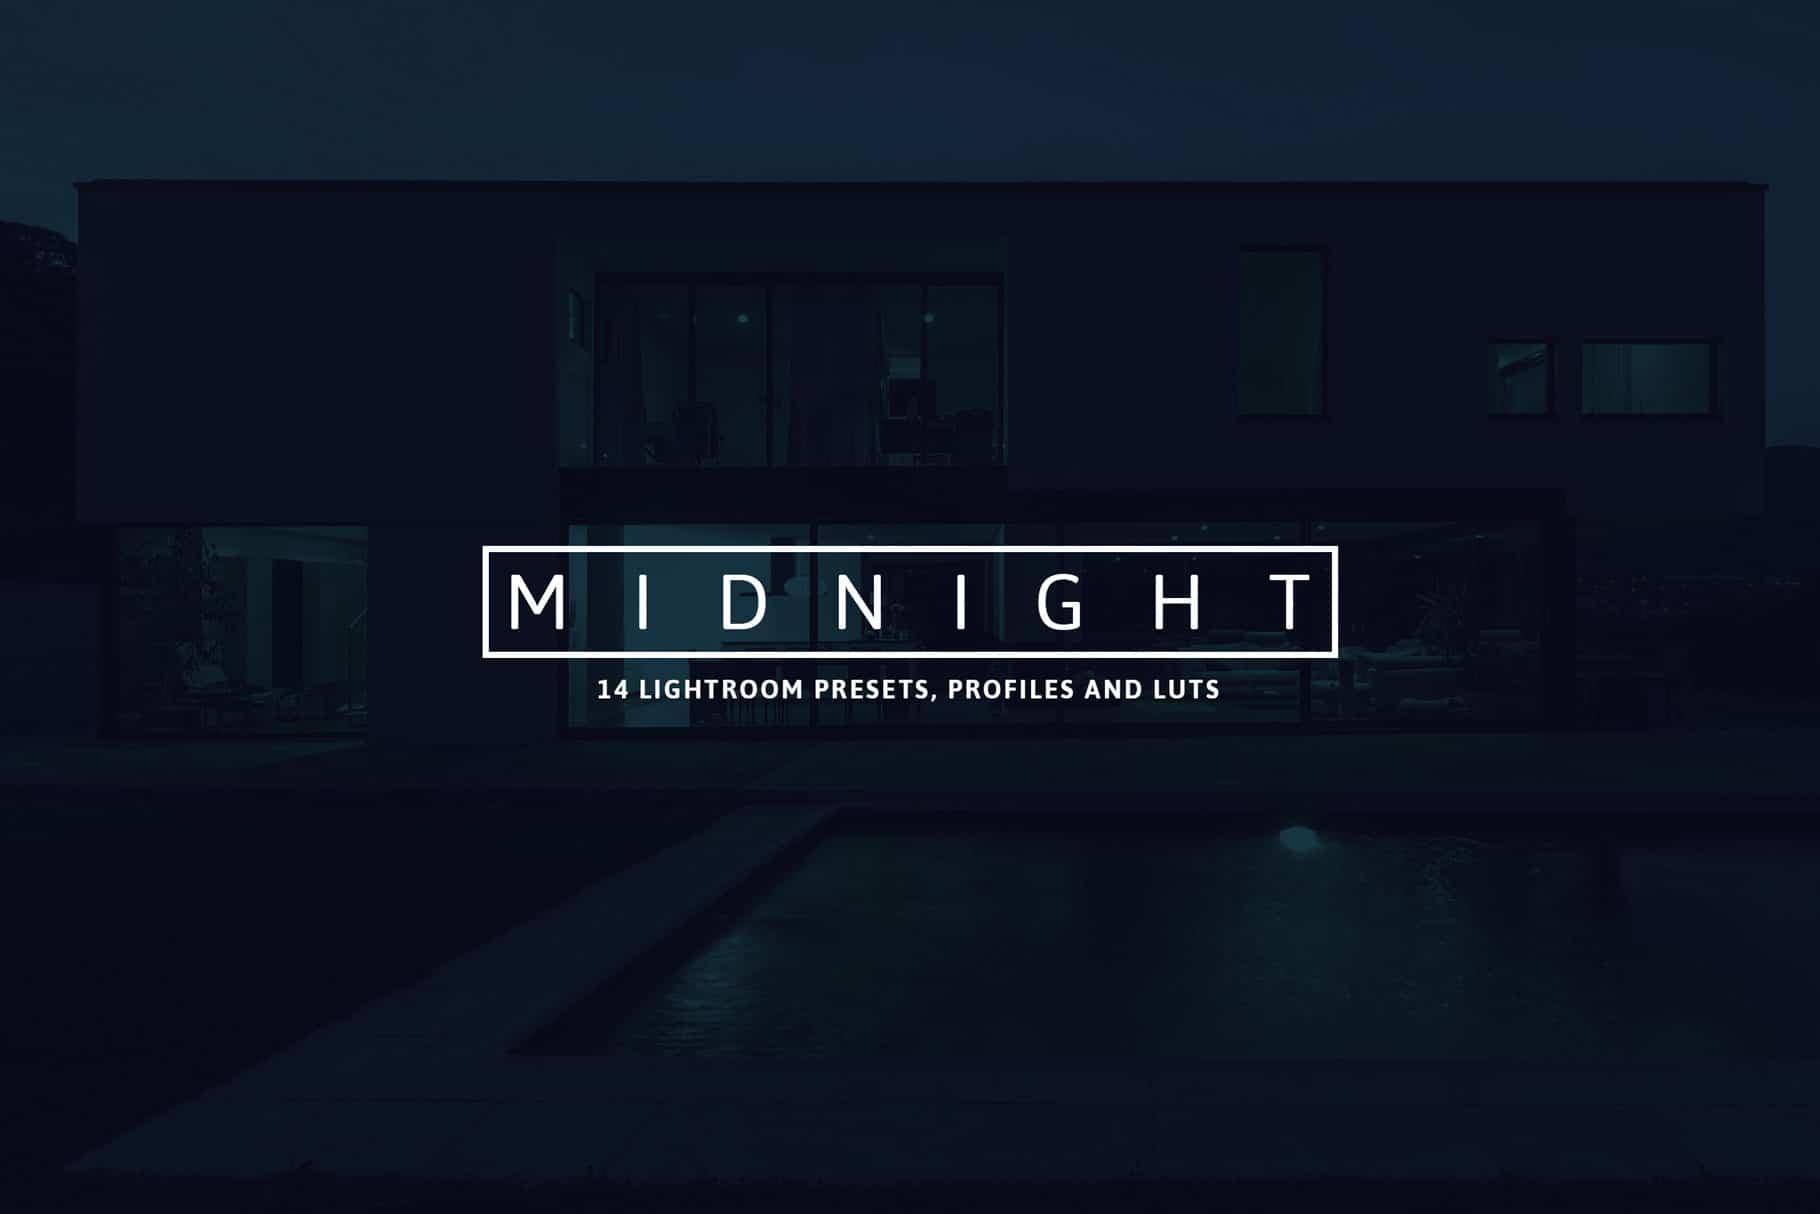 3 Midnight Lightroom Presets and Profiles